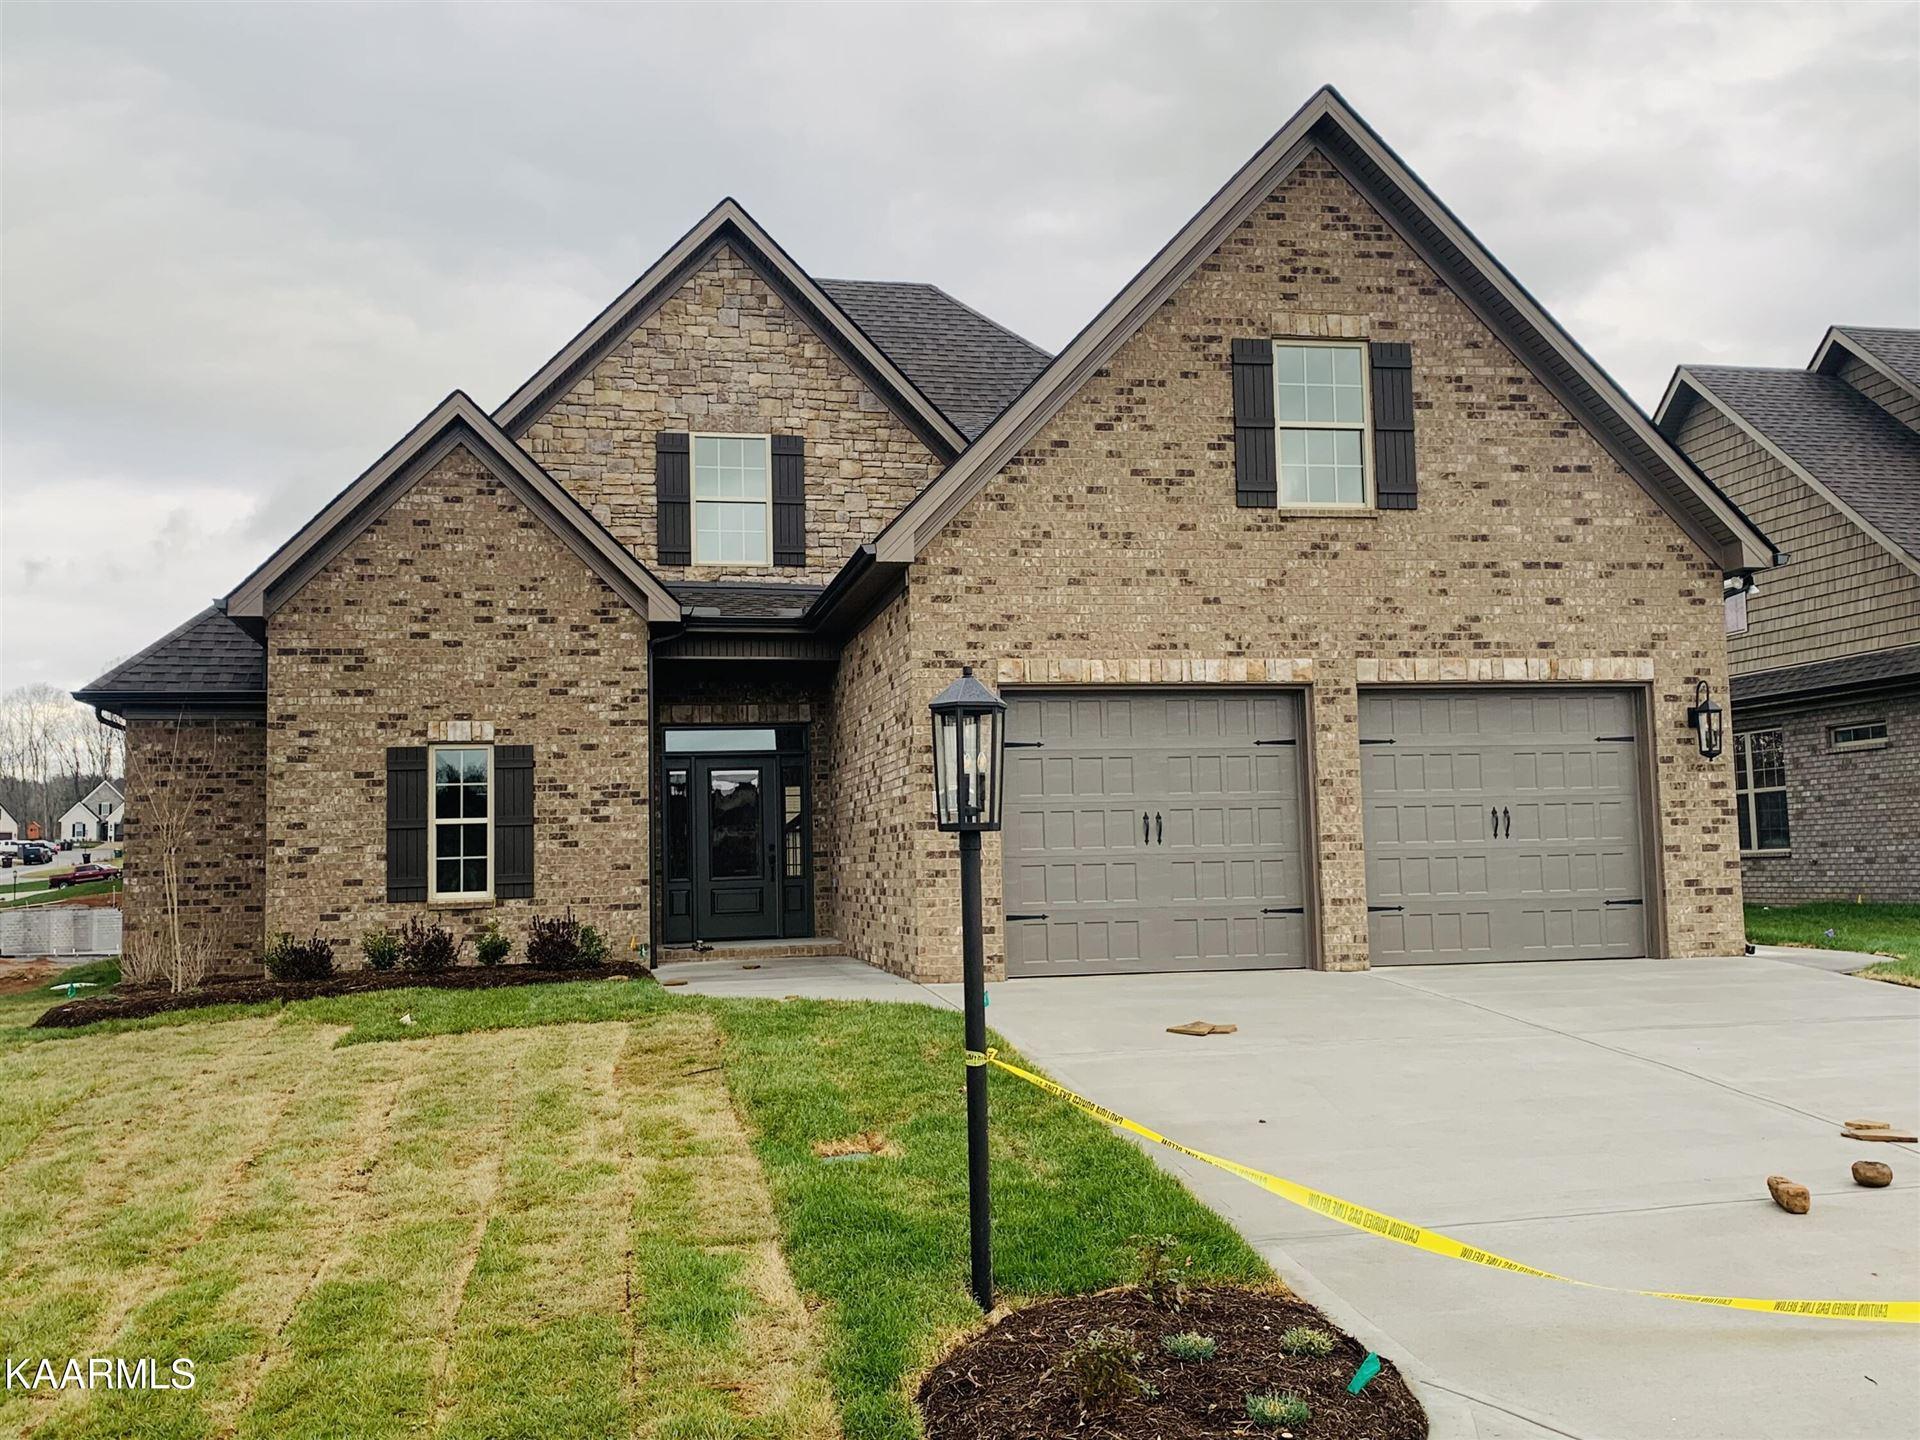 Photo of 909 Valley Glen Blvd, Knoxville, TN 37922 (MLS # 1161391)